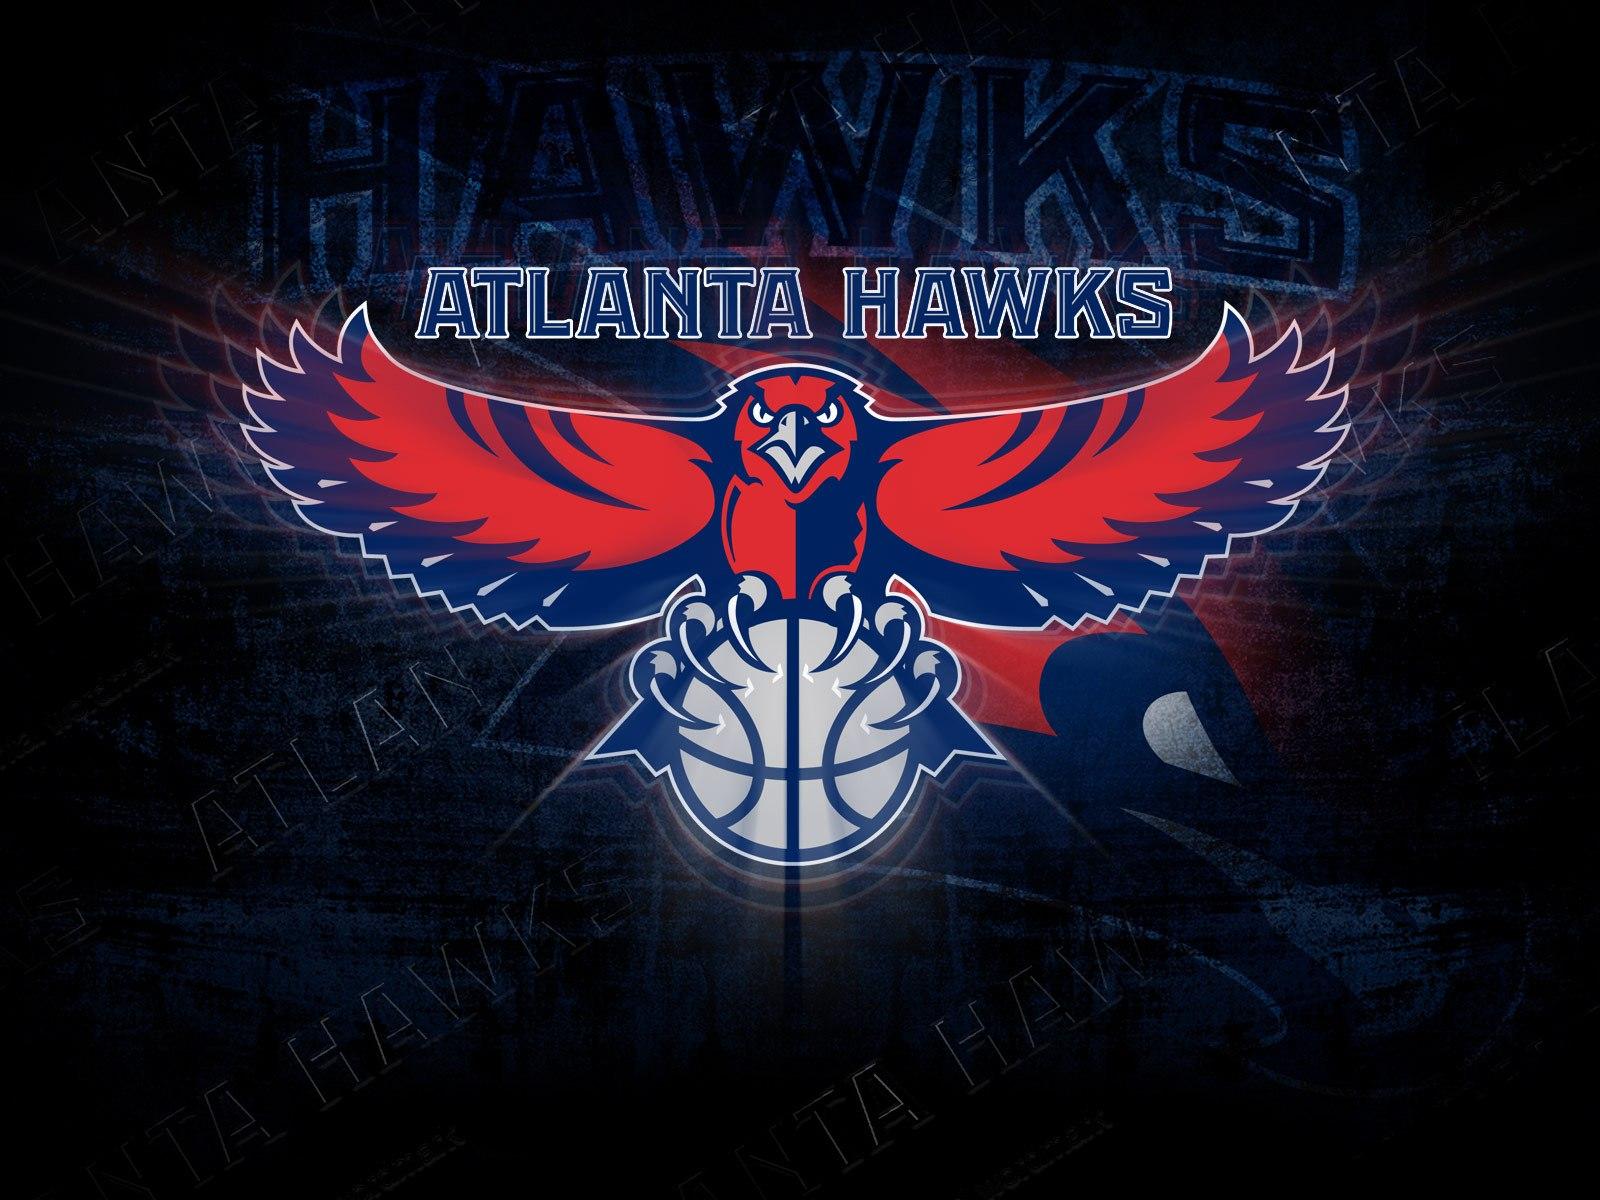 Atlanta Hawks Hd Wallpaper Wallpapersafari